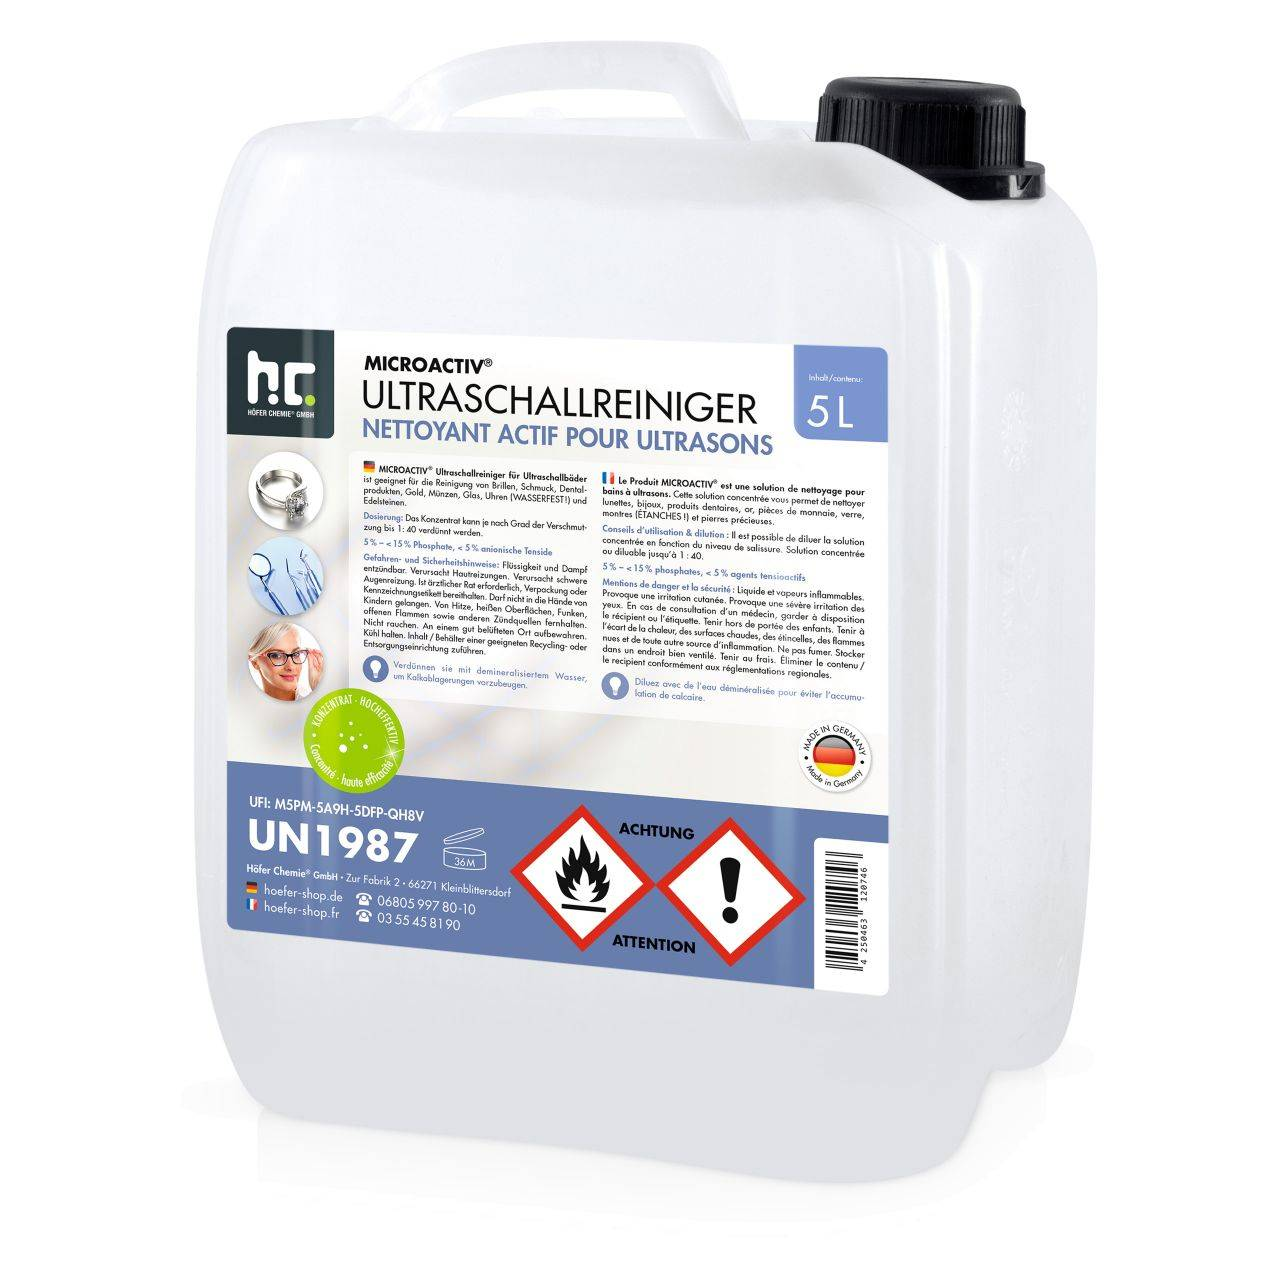 Höfer Chemie 20 l Microactiv® Produit detergent ultrason (4 x 5 l)